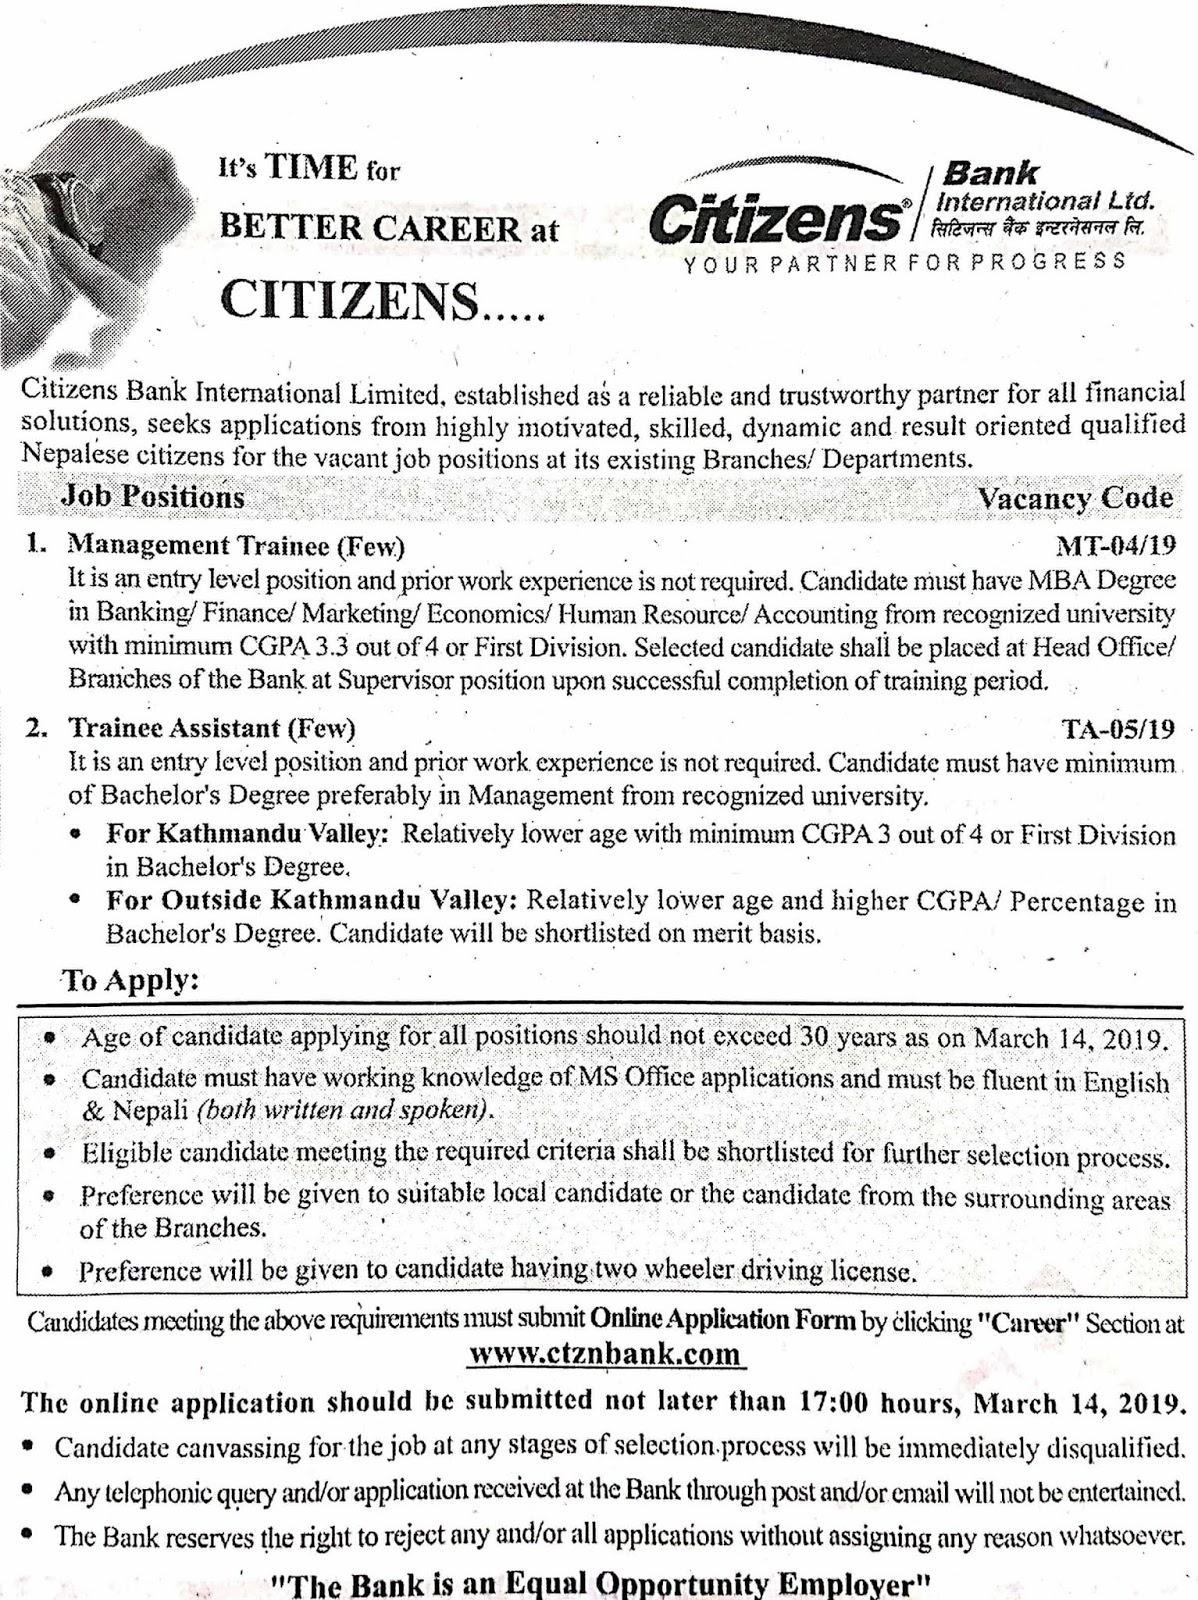 Citizens Bank International Vacancy Notice